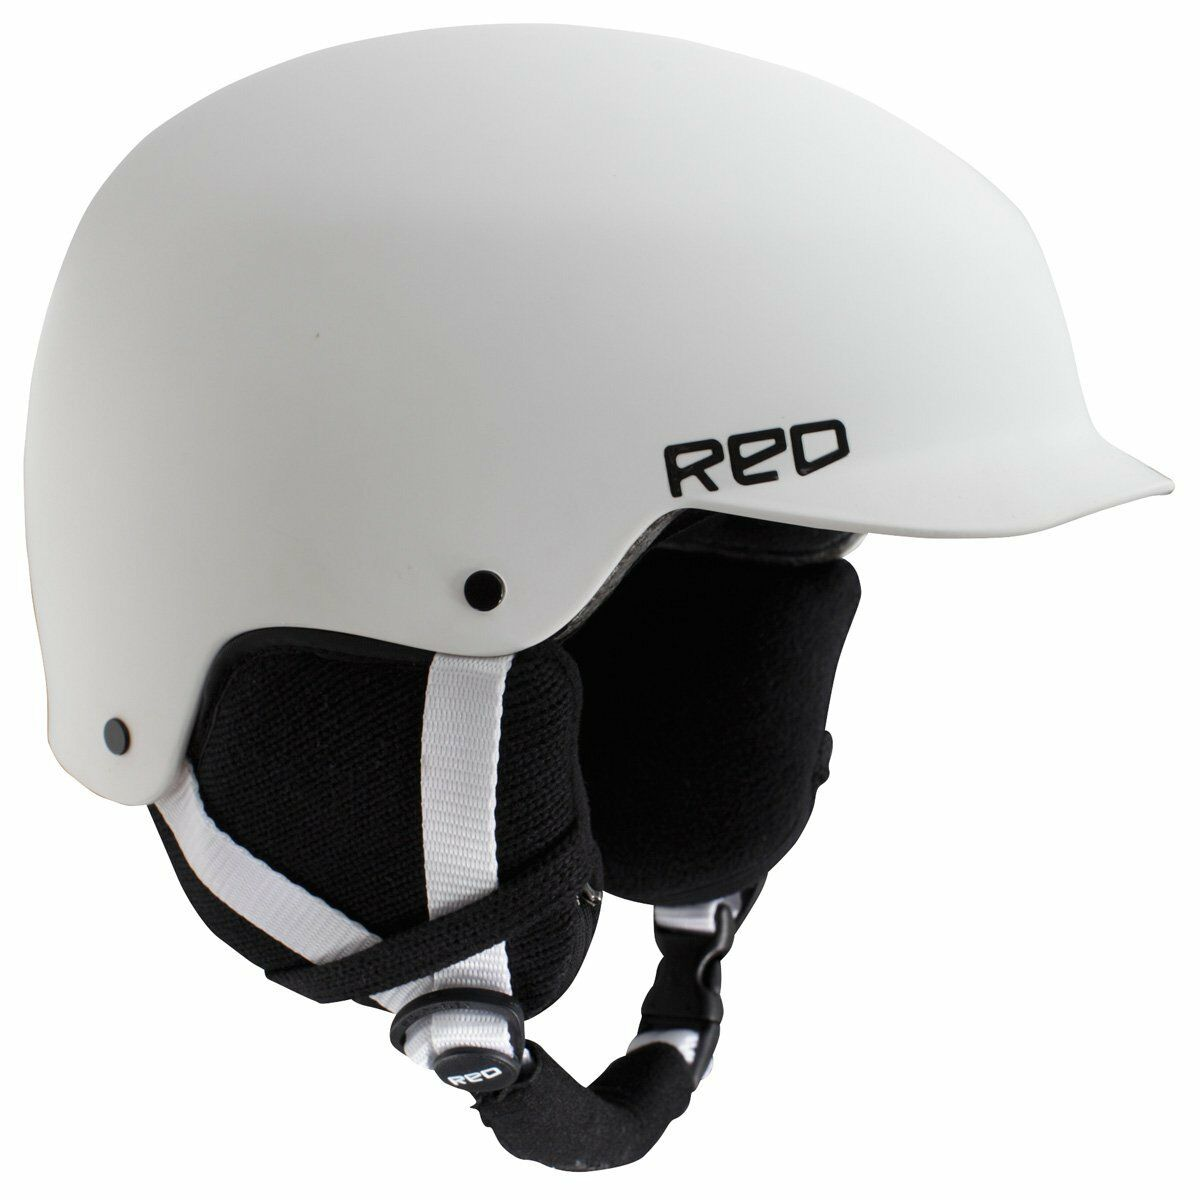 RED Mutiny Ski Snowboard Helmet White Small (55-57 CM) - New